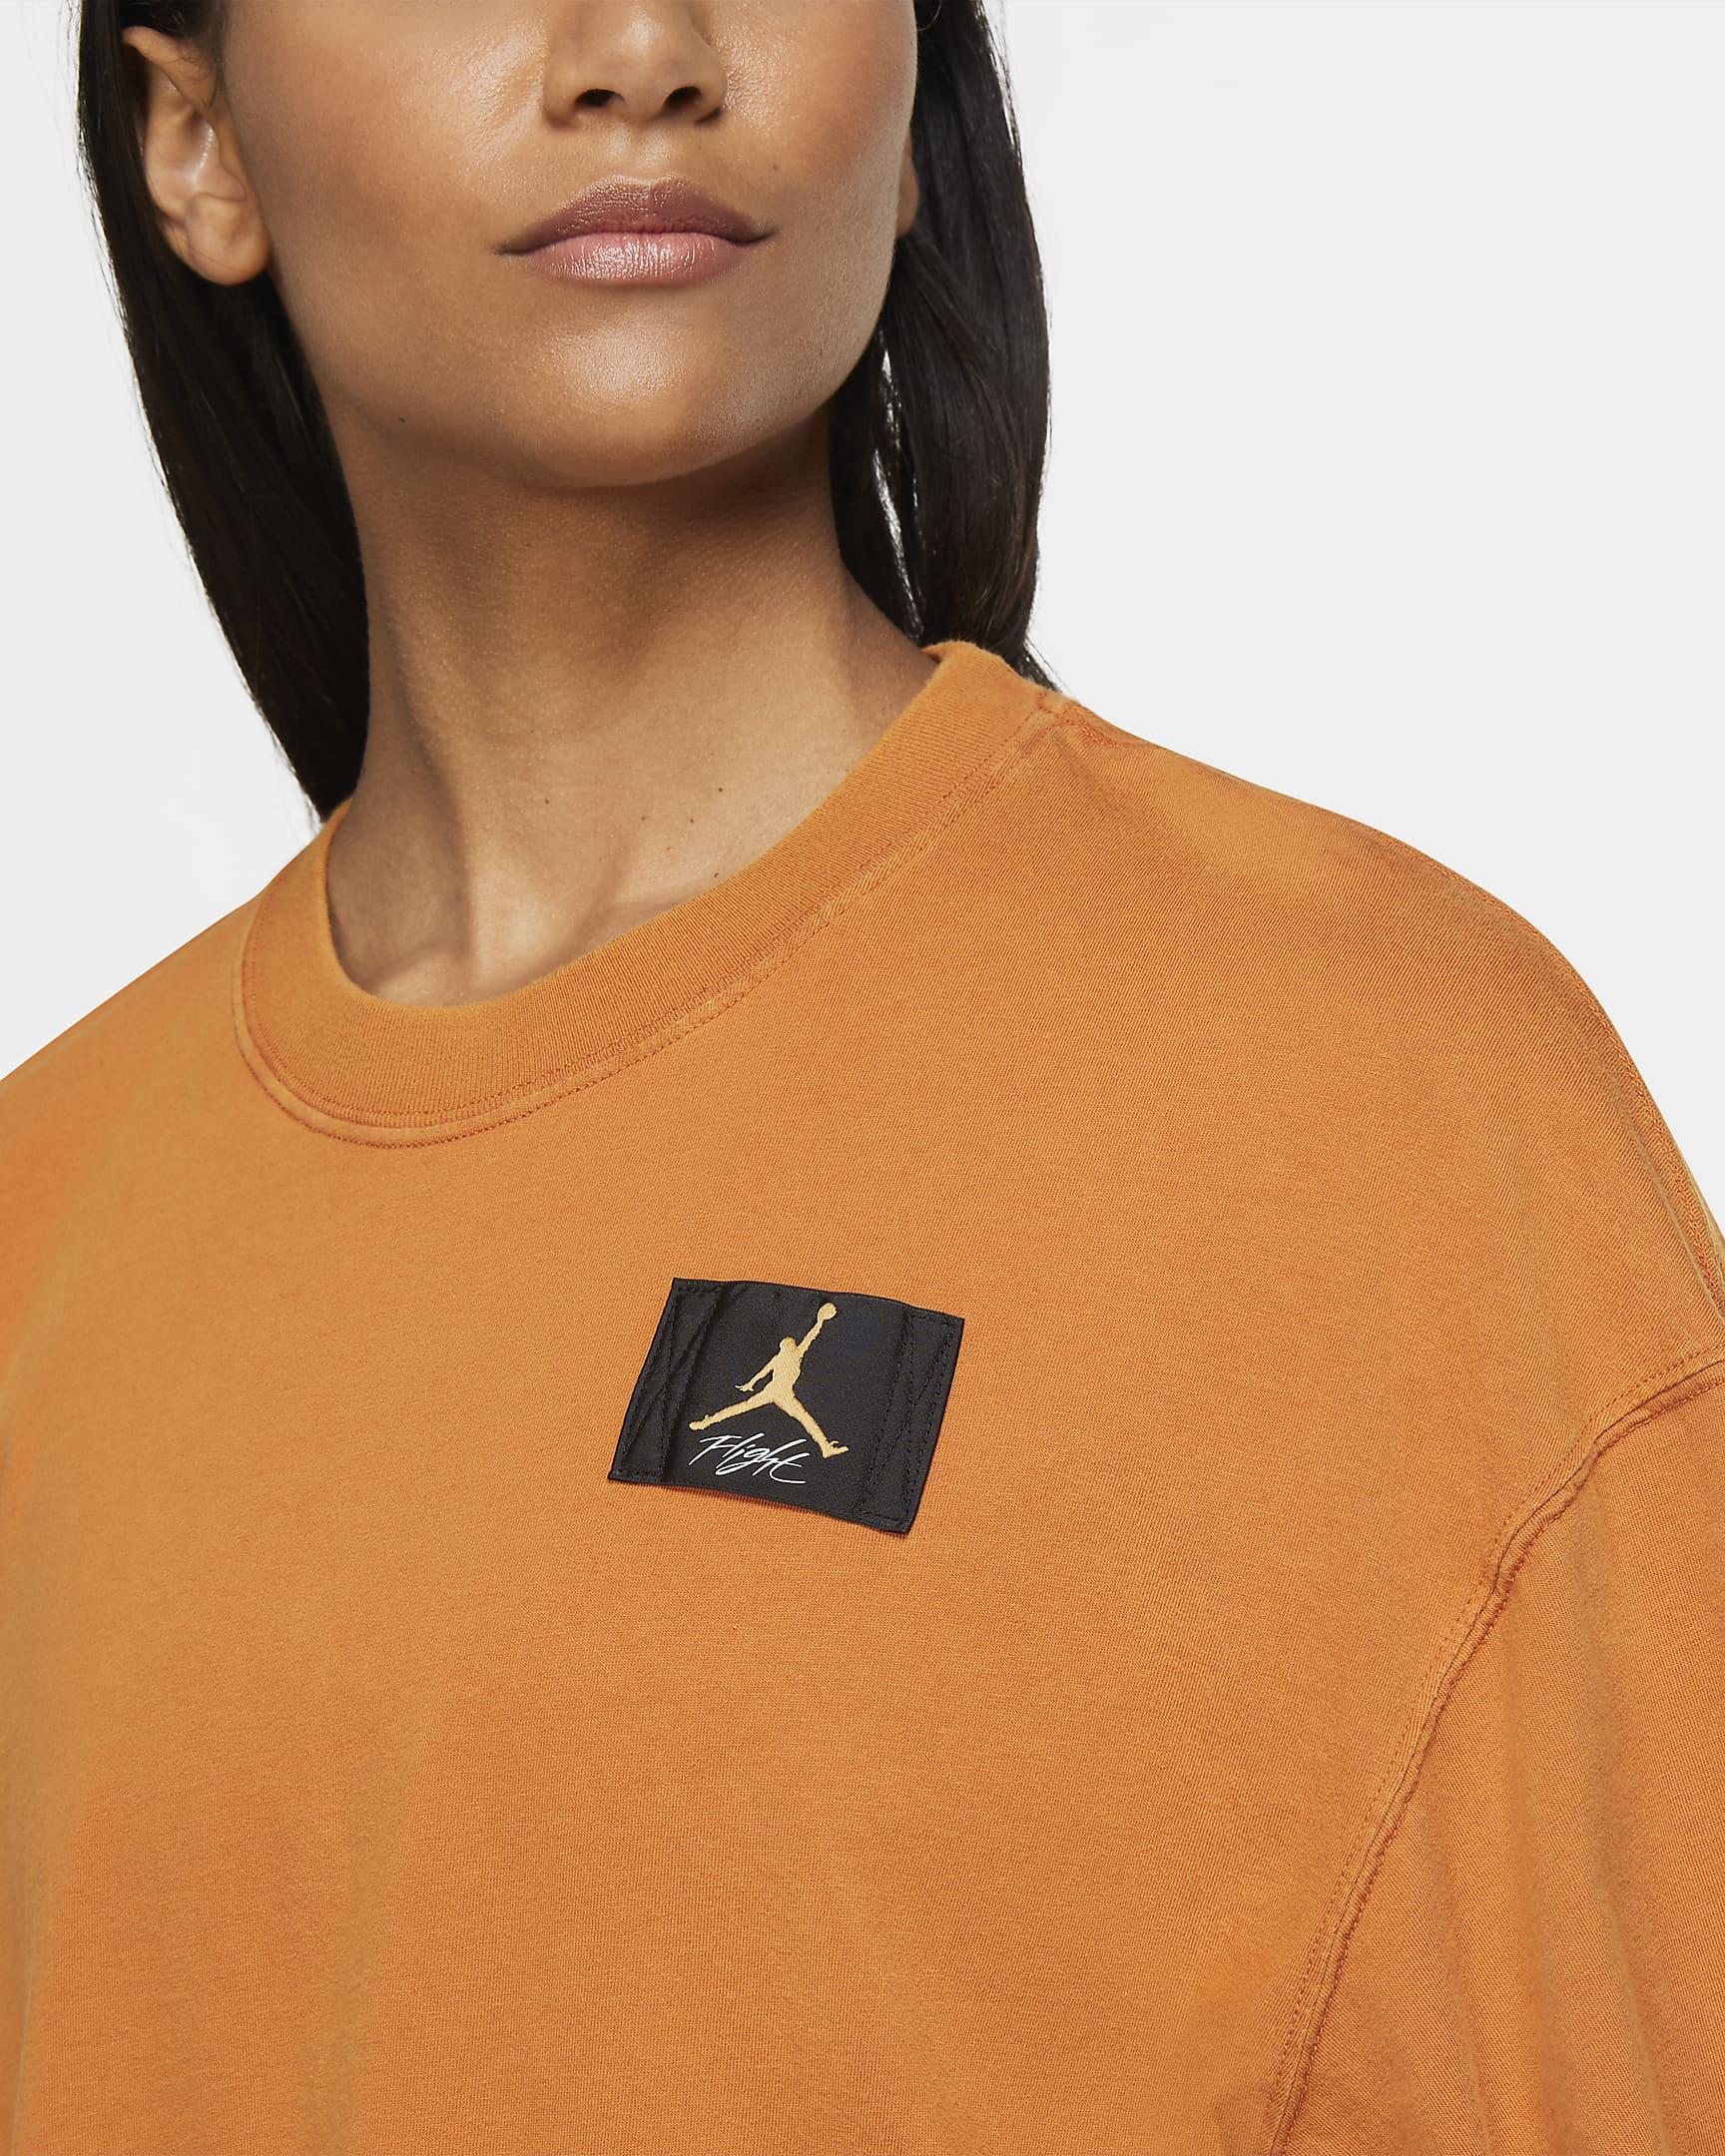 jordan-essentials-womens-short-sleeve-boxy-t-shirt-9xLPQl-1